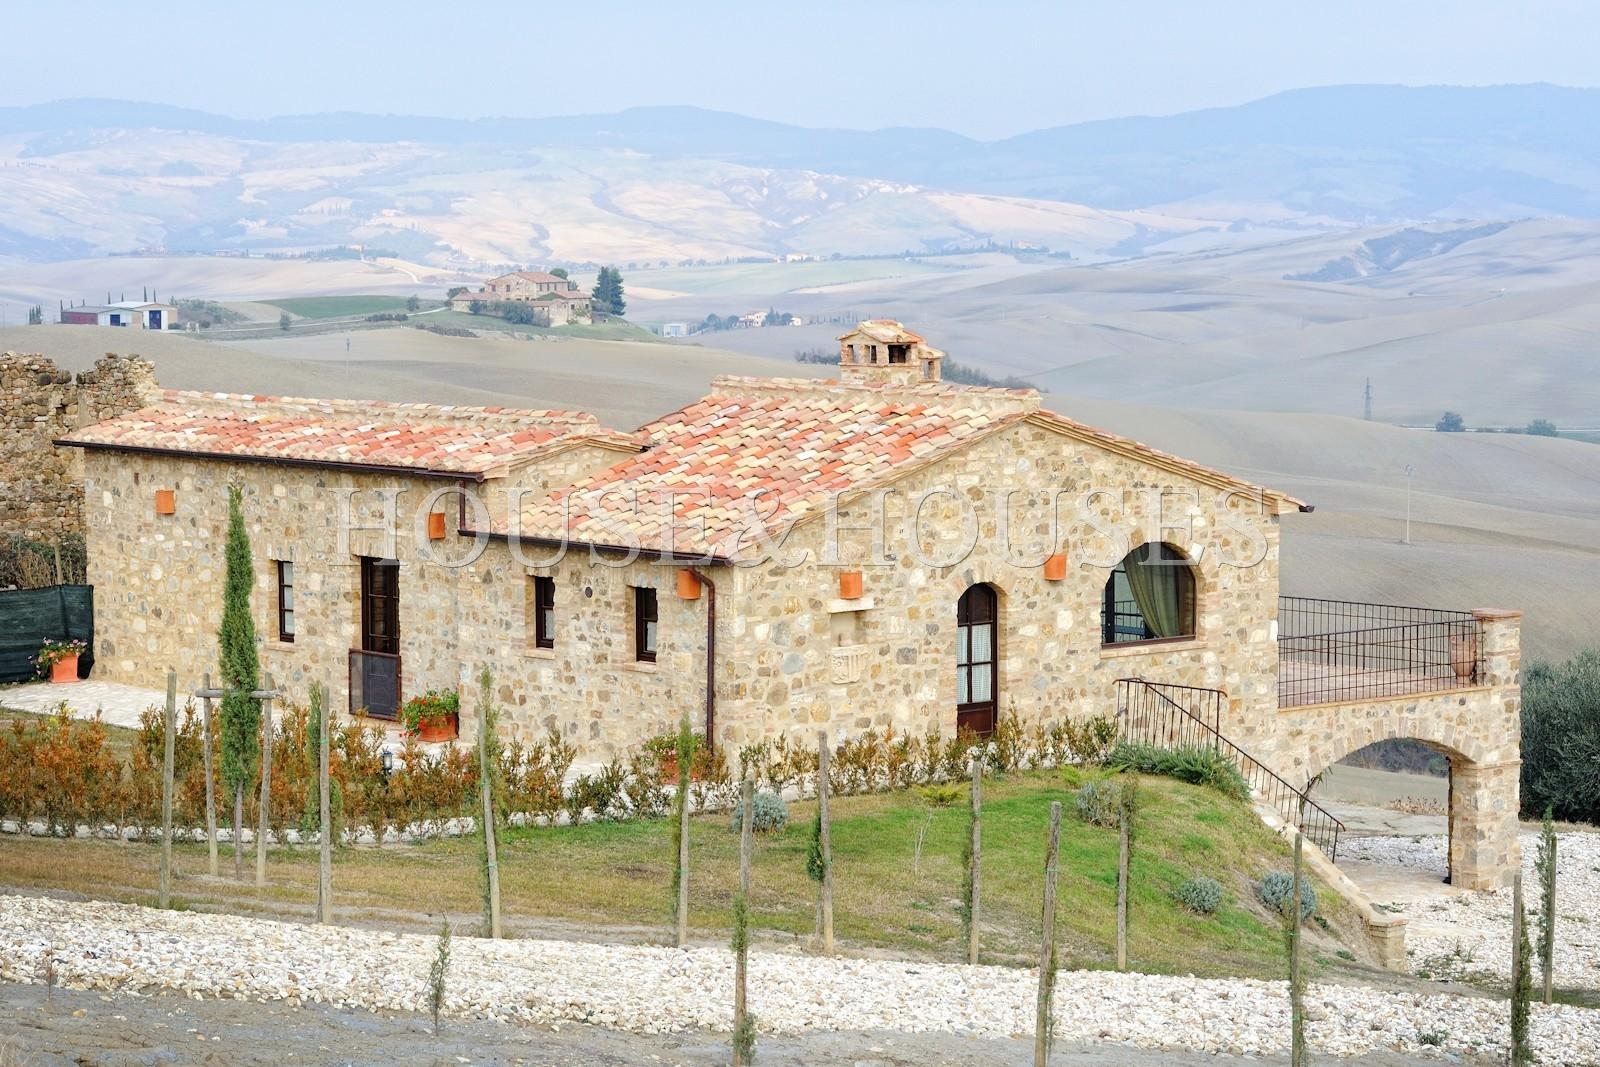 Toscana siena castiglione d 39 orcia casale in vendita - Casale in toscana ...